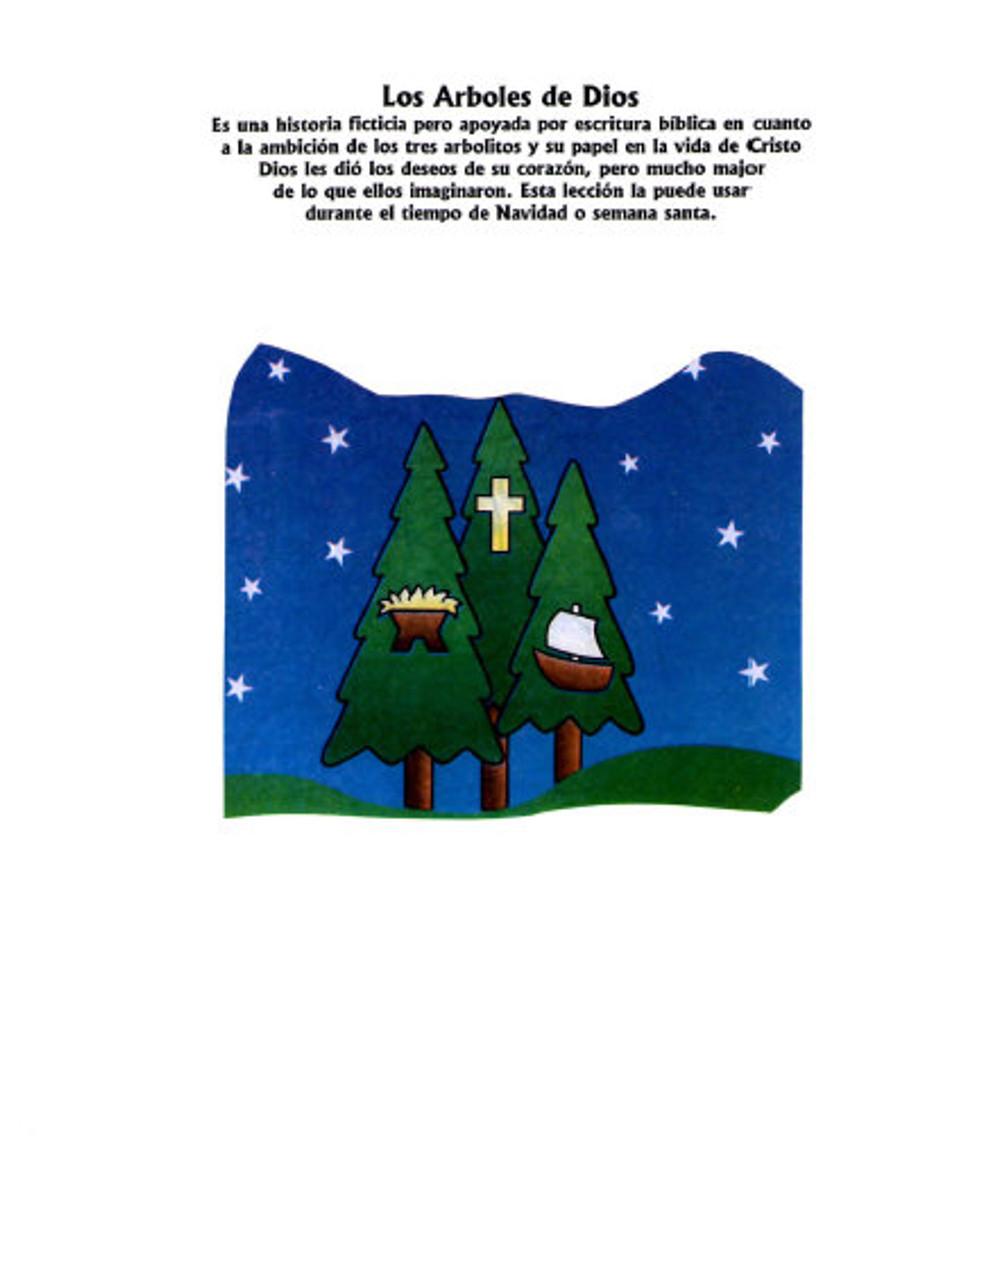 Los Arboles de Dios (God's Trees)